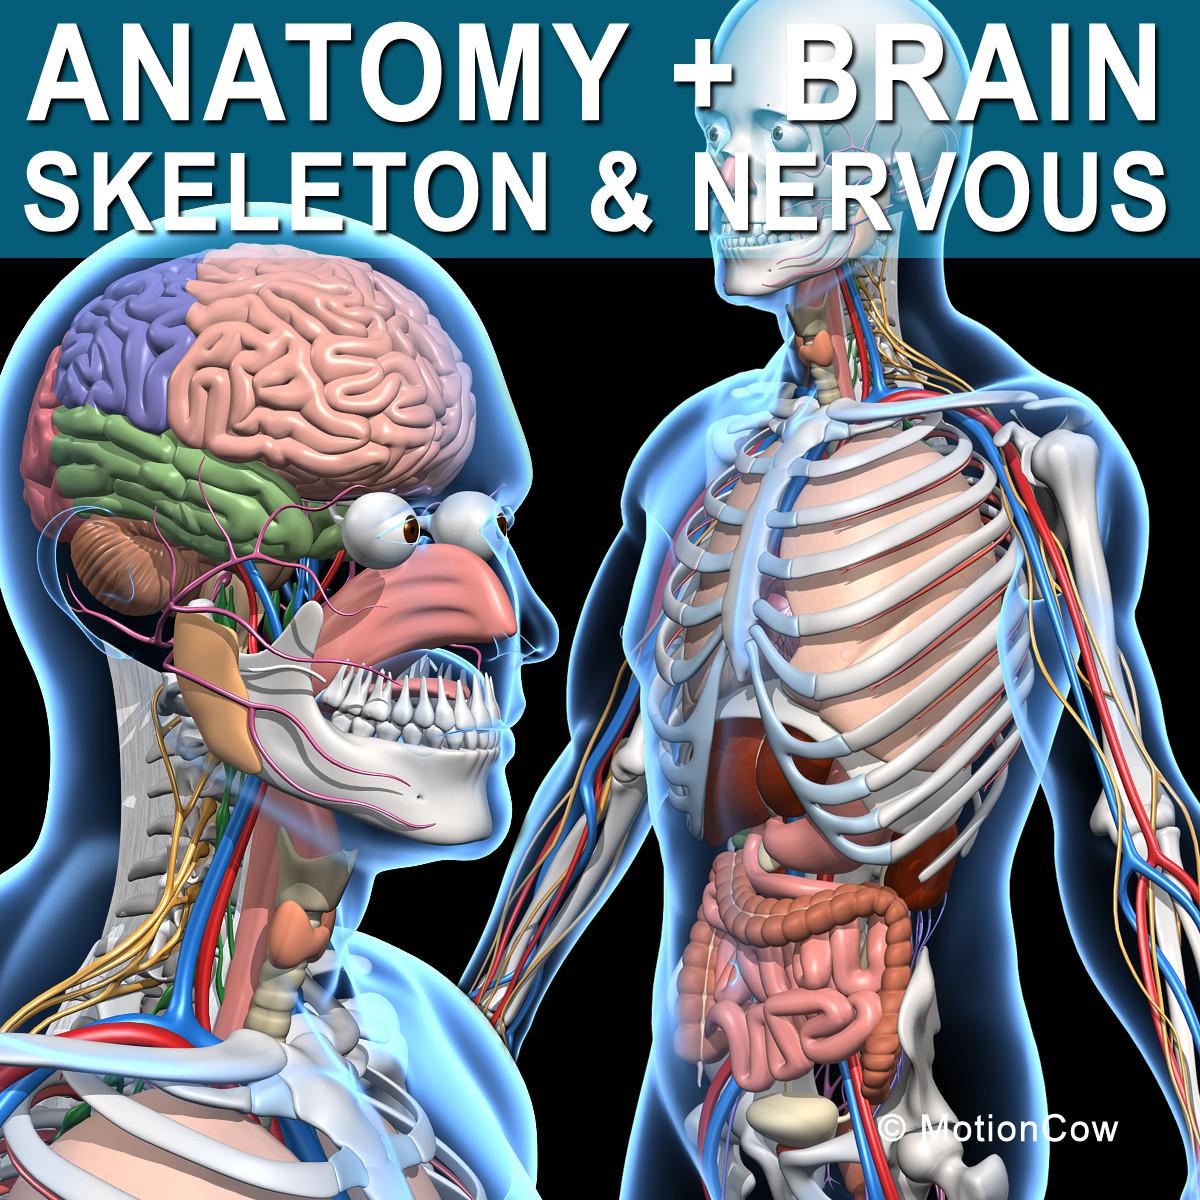 Human Skeleton Nerves | tenderness.co